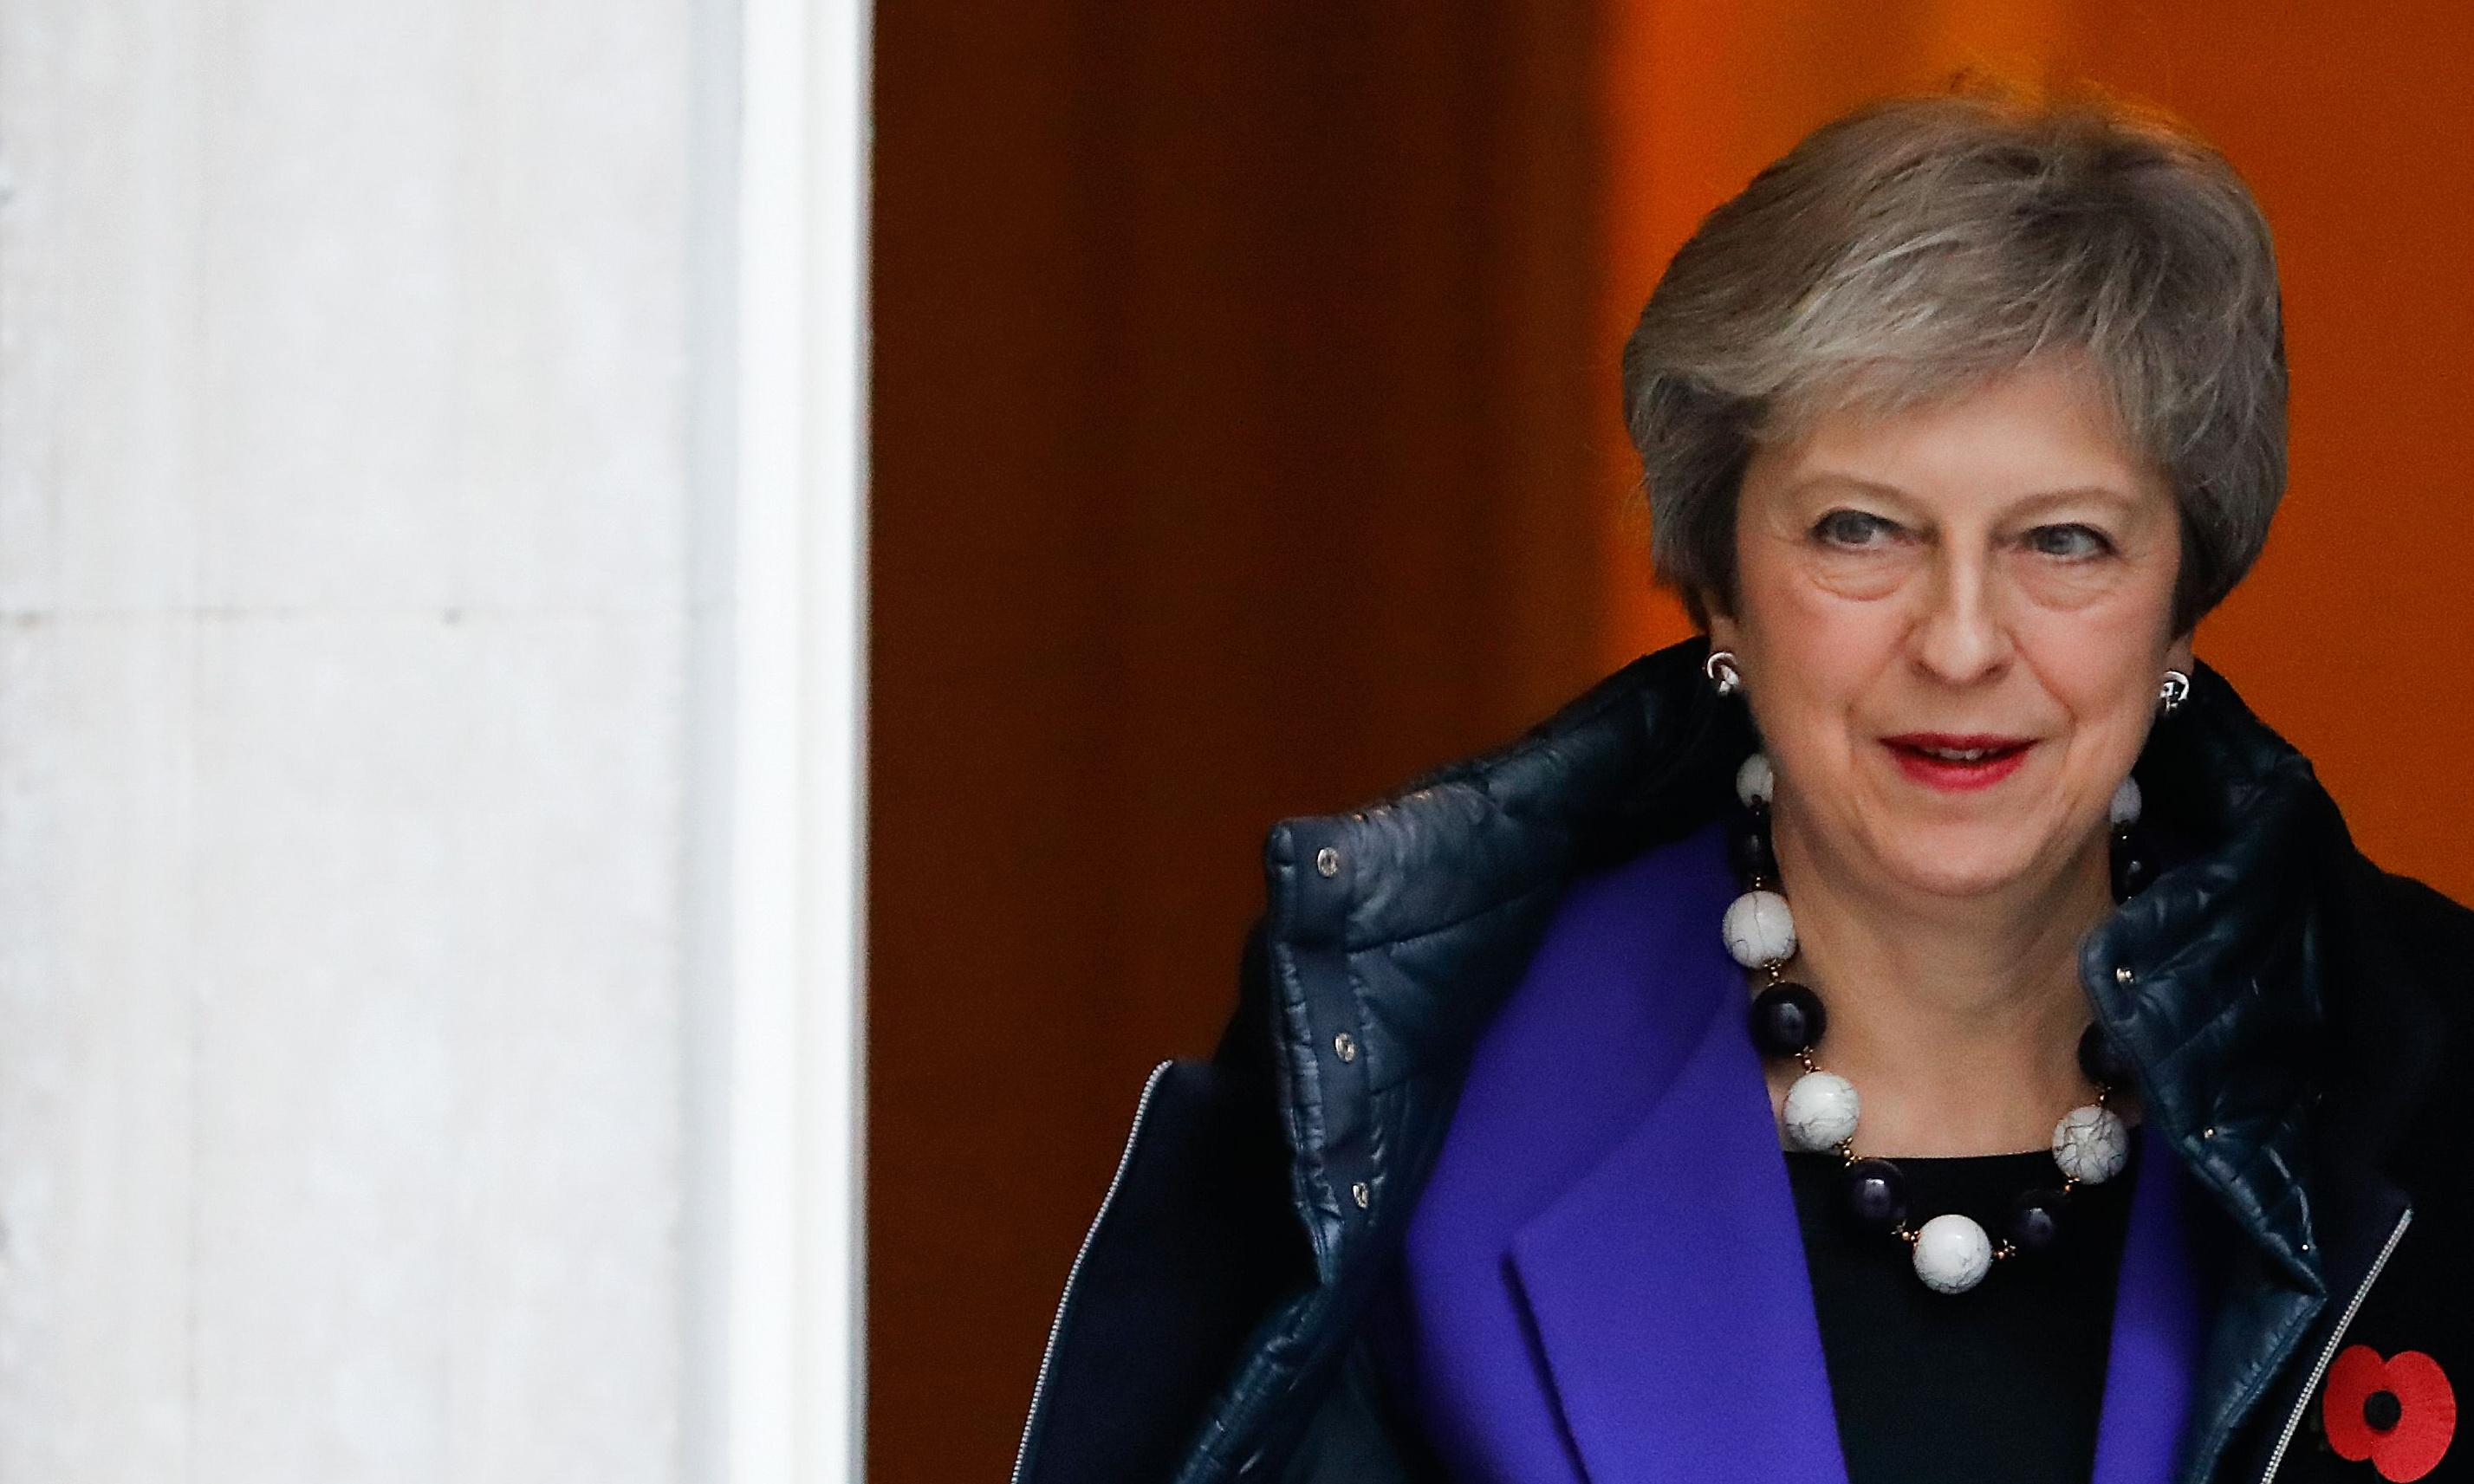 Britain's arrogant attempts to hoodwink the EU have sacrificed all trust